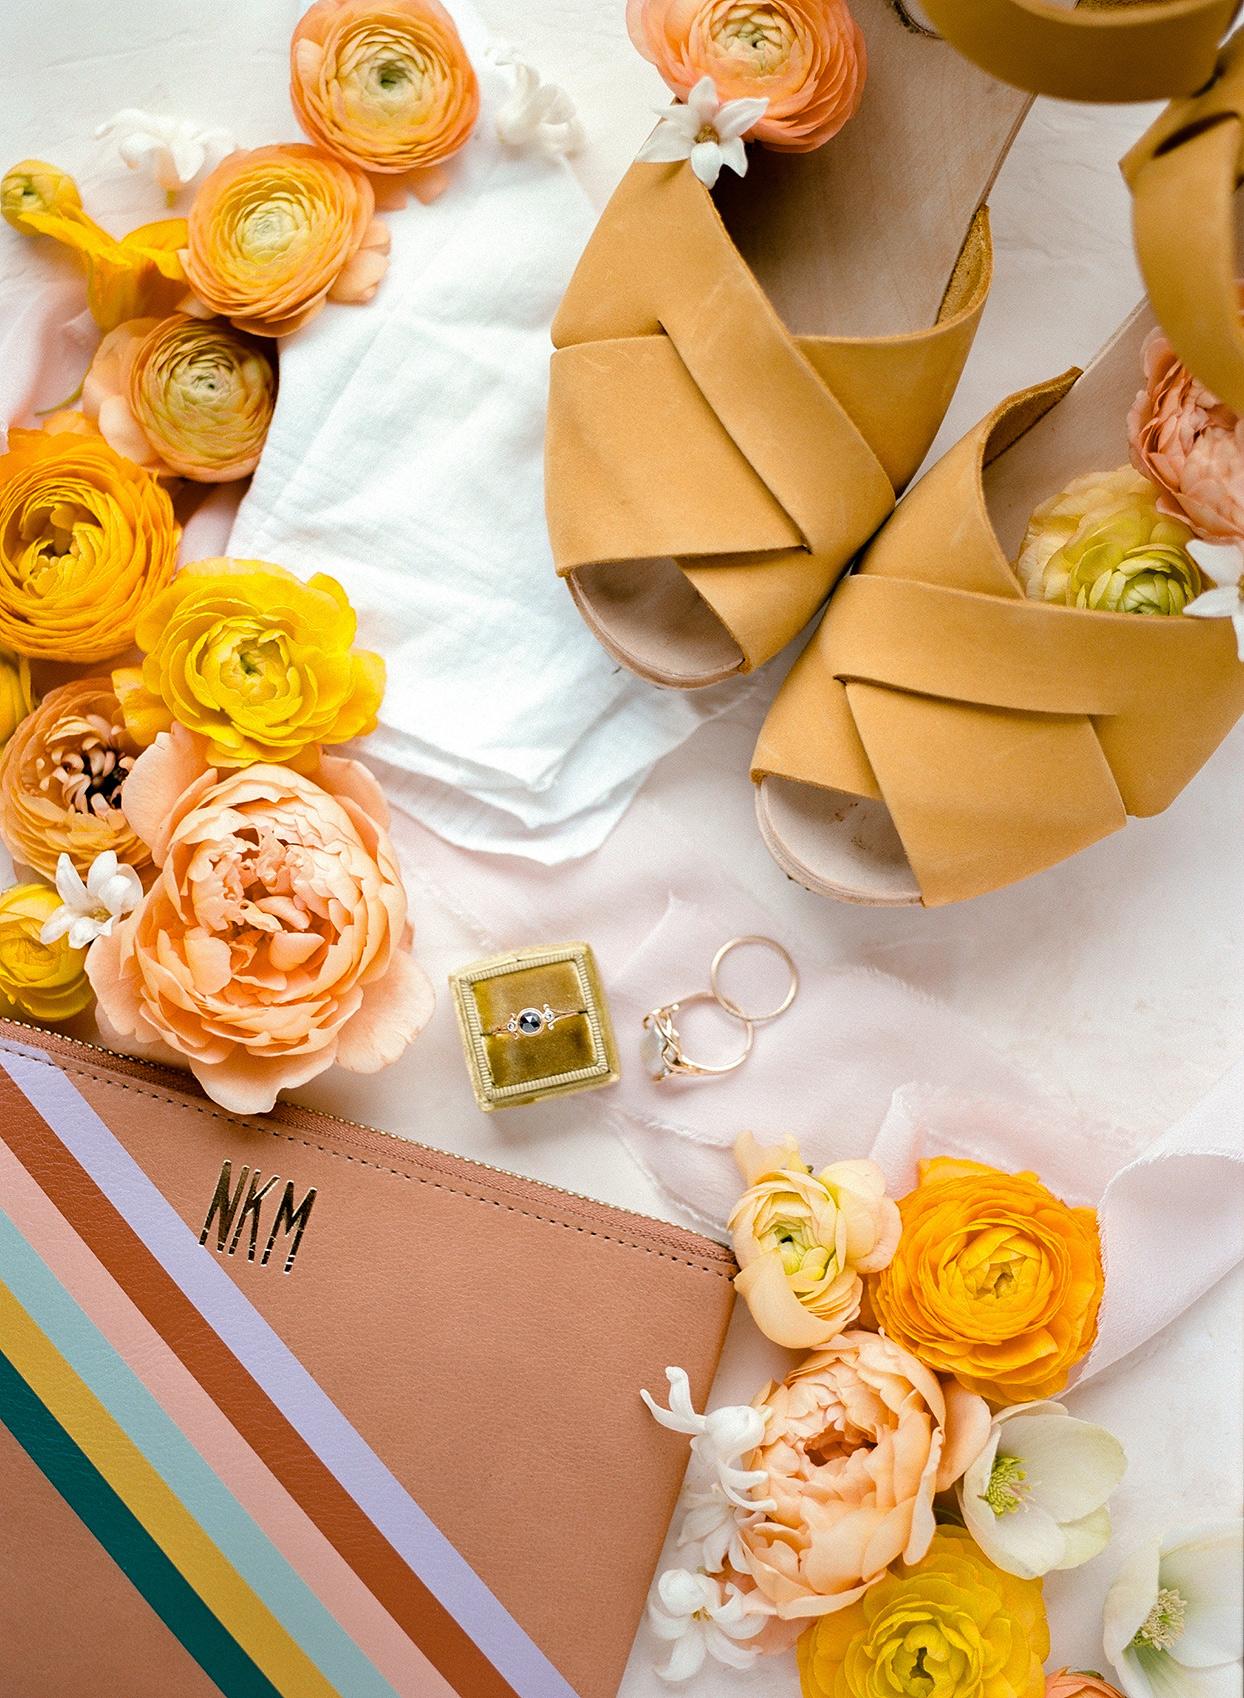 nina devon wedding mustard yellow flowers and accessories